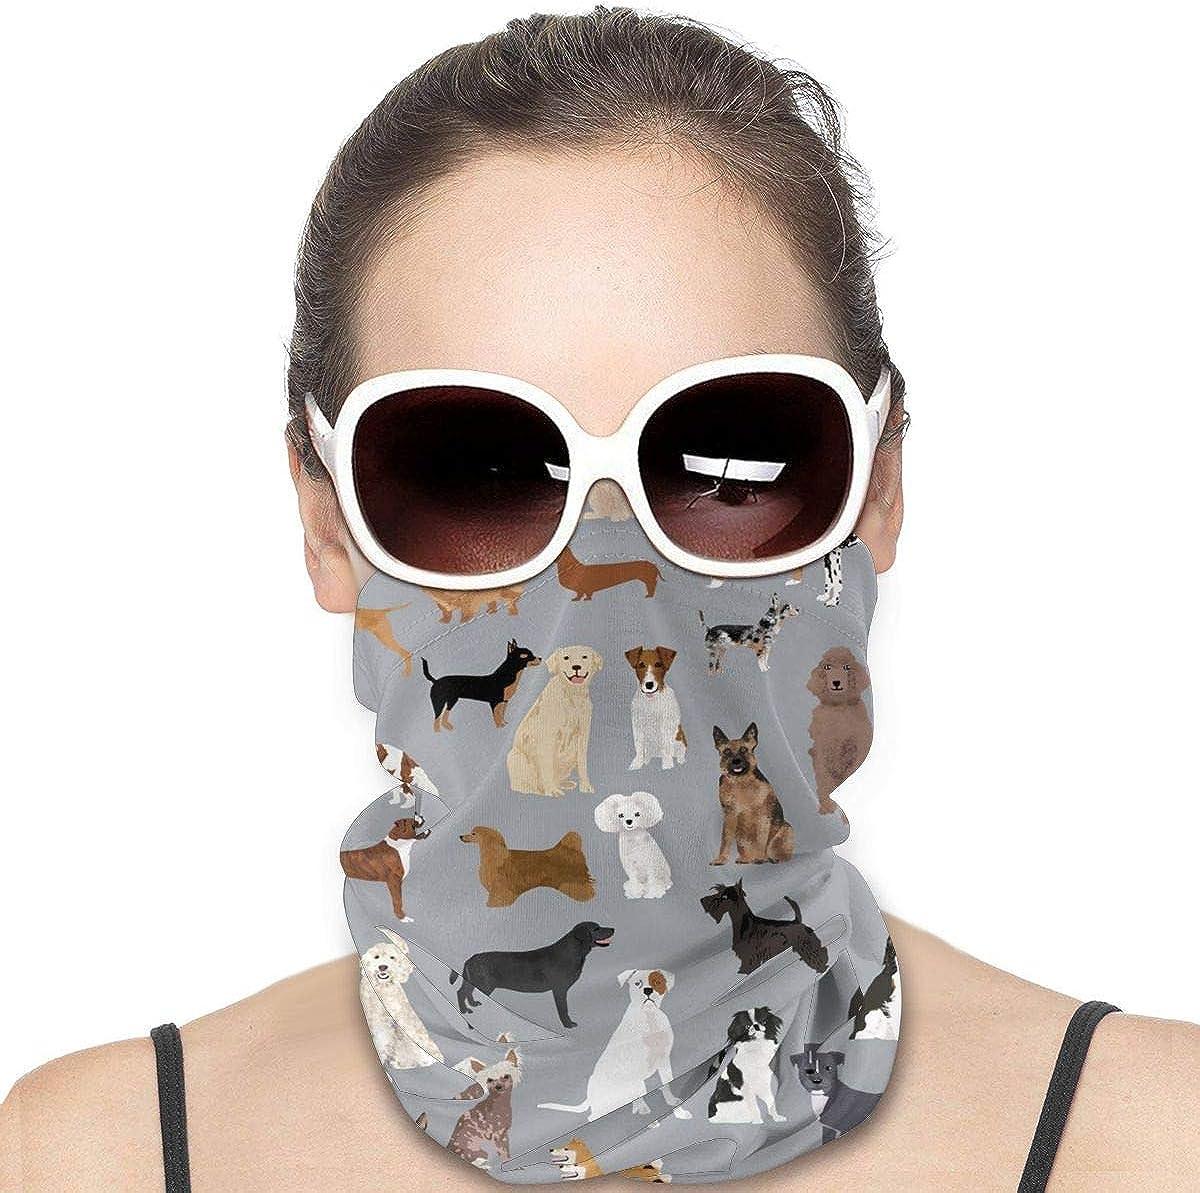 Tidyki Bandana Face Mask - Mixed Dog Lots of Dogs Art Print Pattern Grey Bandana Face Mask Ski Mask Neck Gaiter Head Bands Face Cover Headwear Neck Warmer for Men